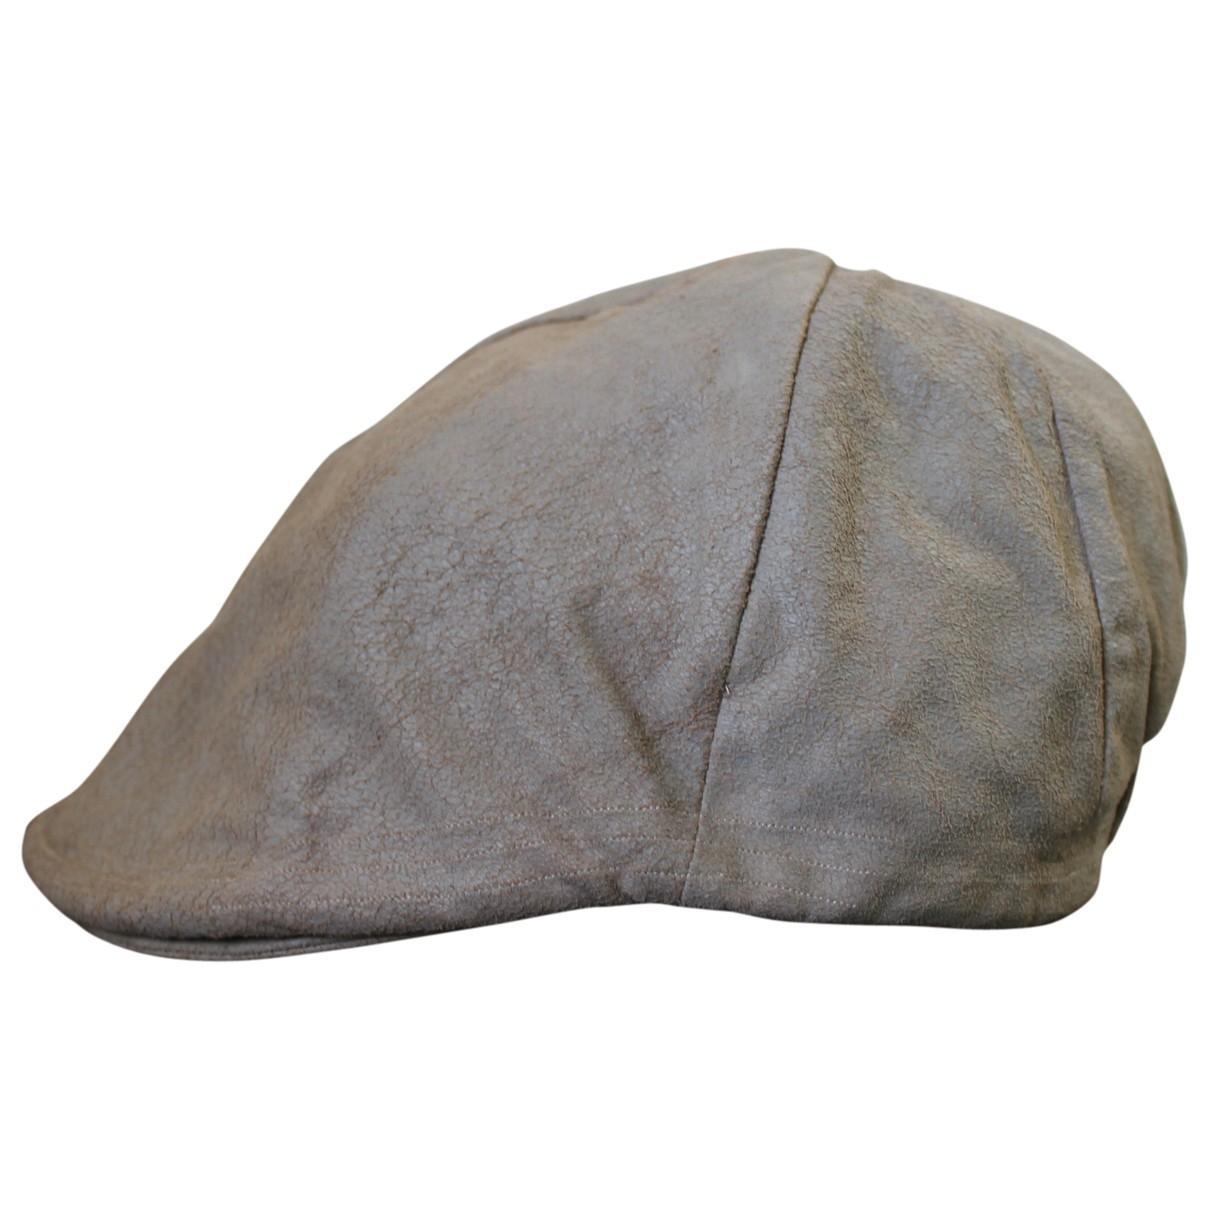 Diesel Black Gold \N Beige Leather hat for Women 58 cm